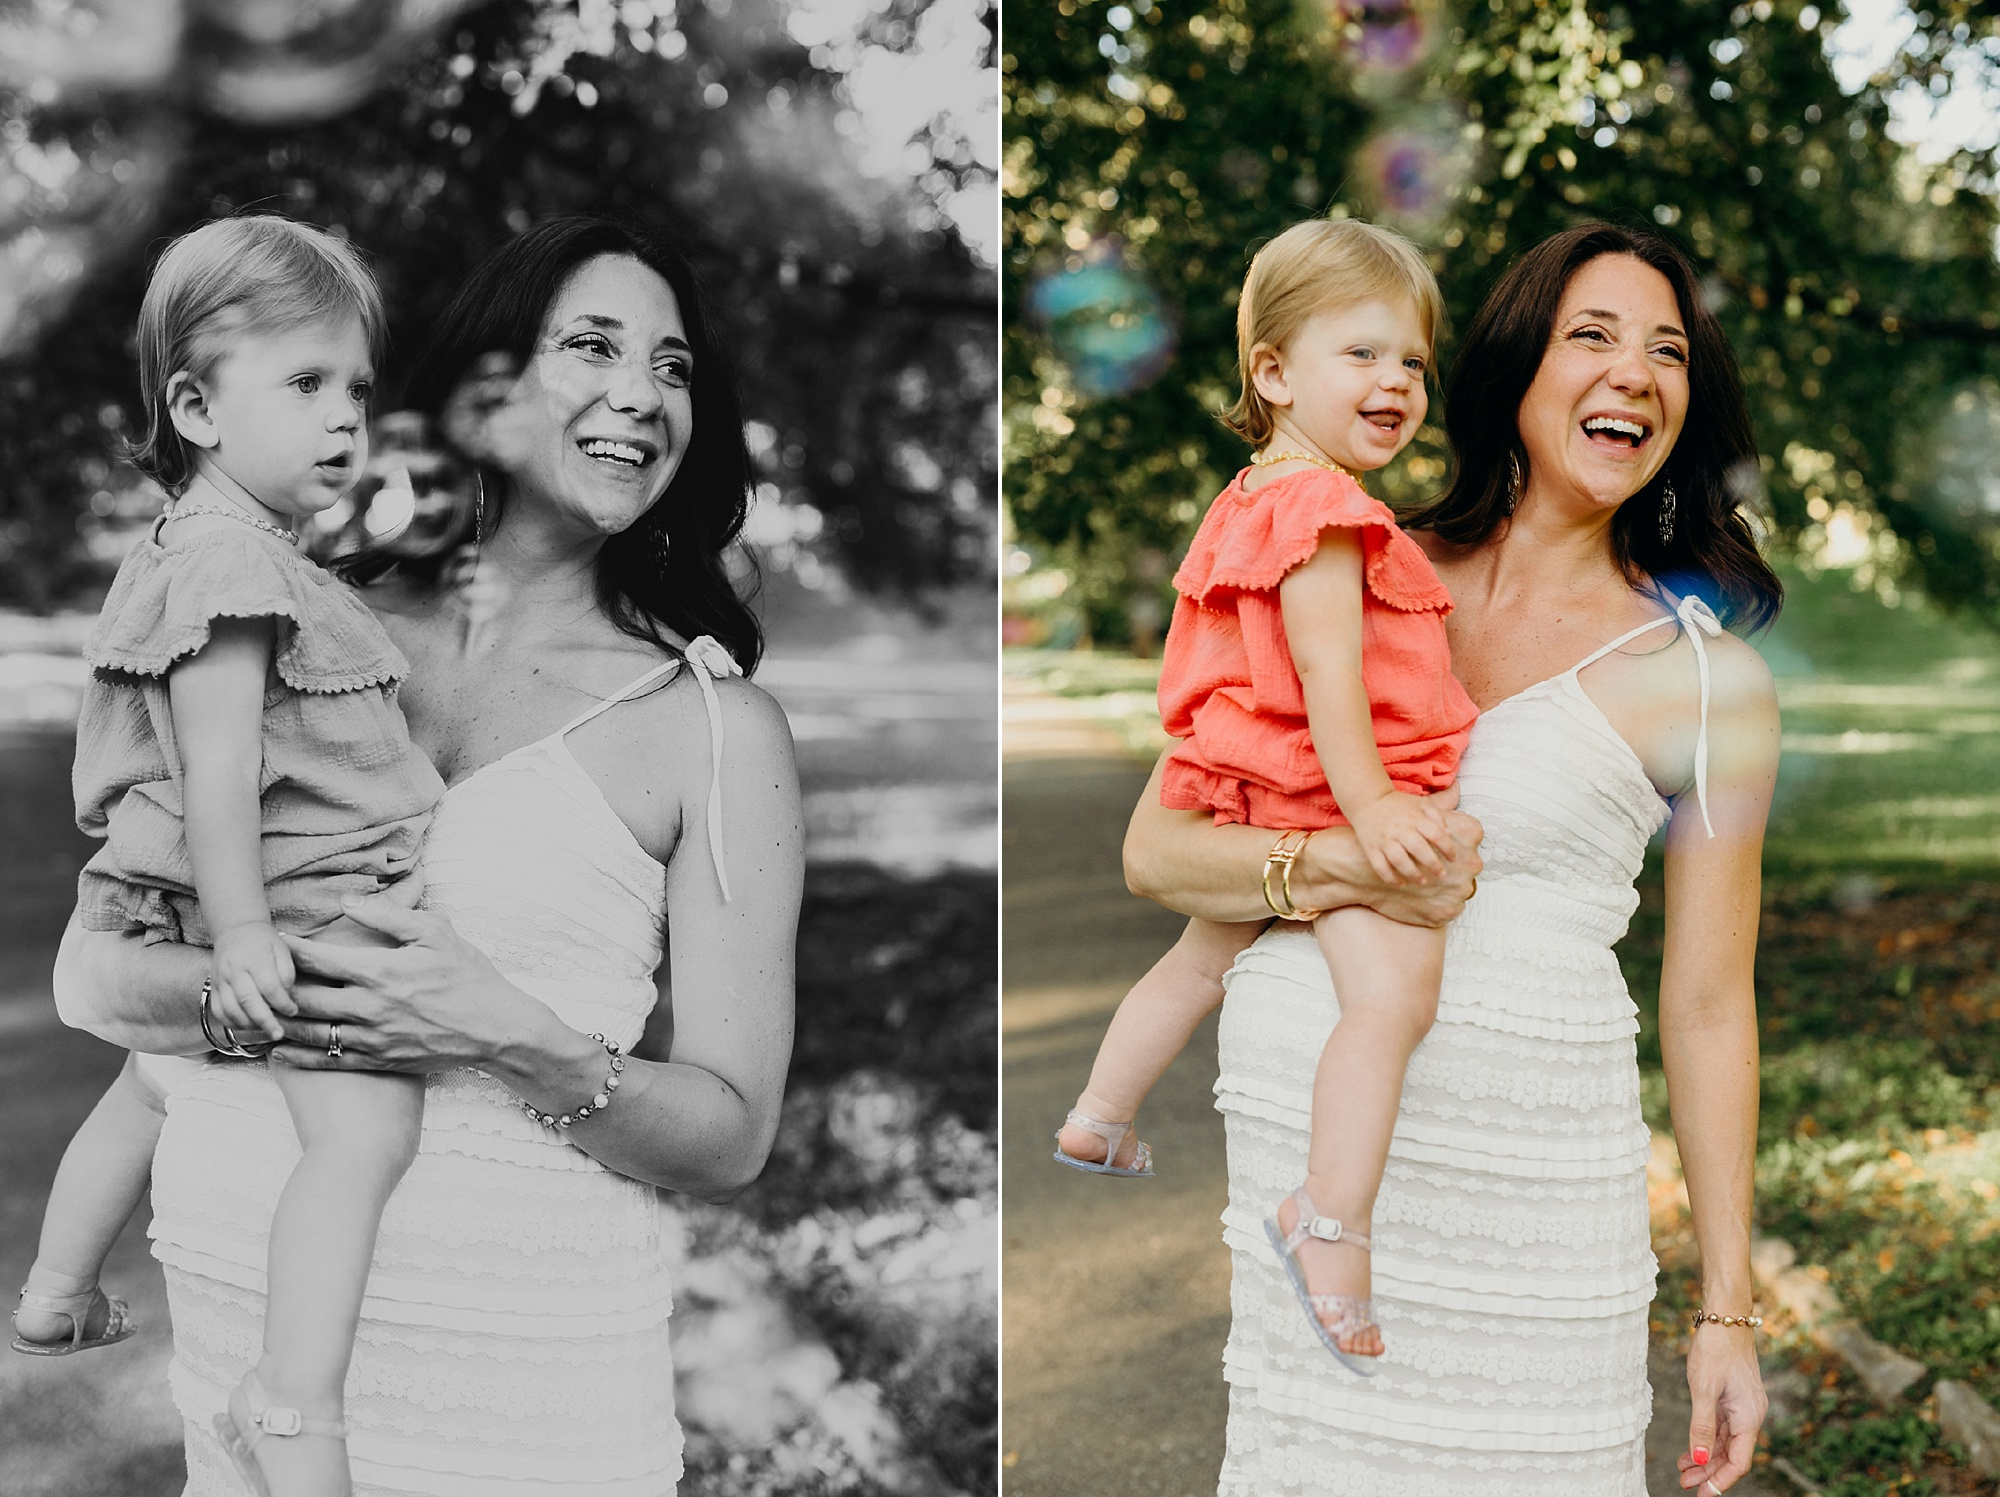 Joe_Mac_Creative_Maternity_West_Chester_Wedding_Photography_Philly_Best_Philadlephia__0125.jpg